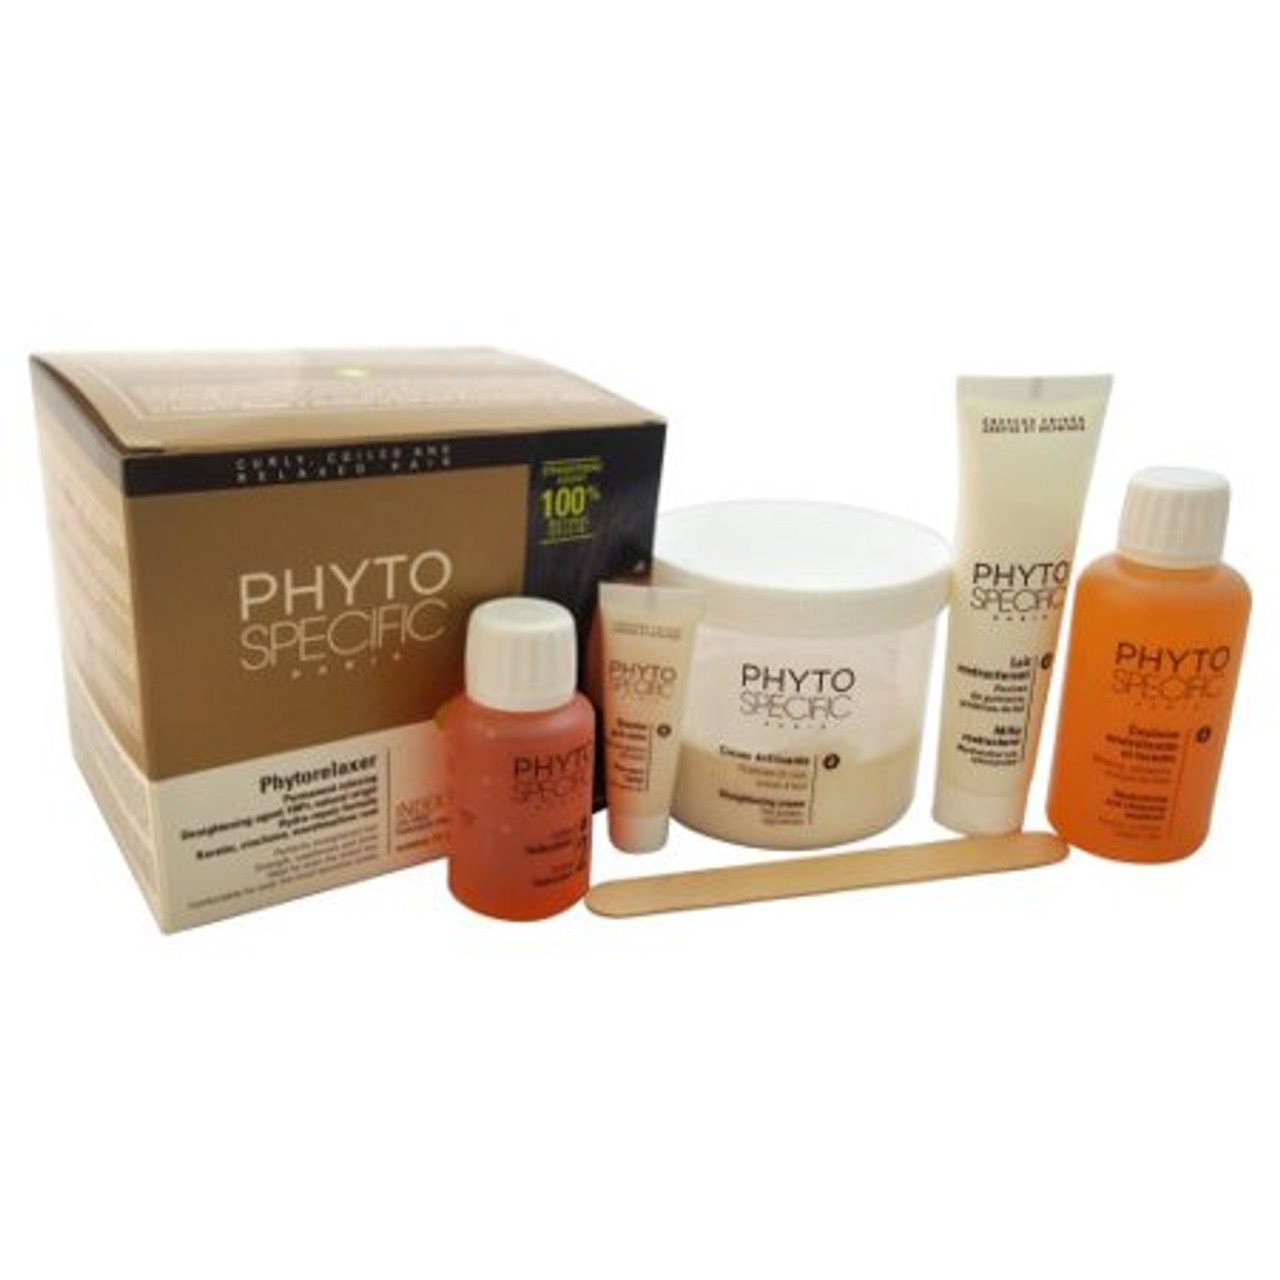 Phytospecific Phytorelaxer 2